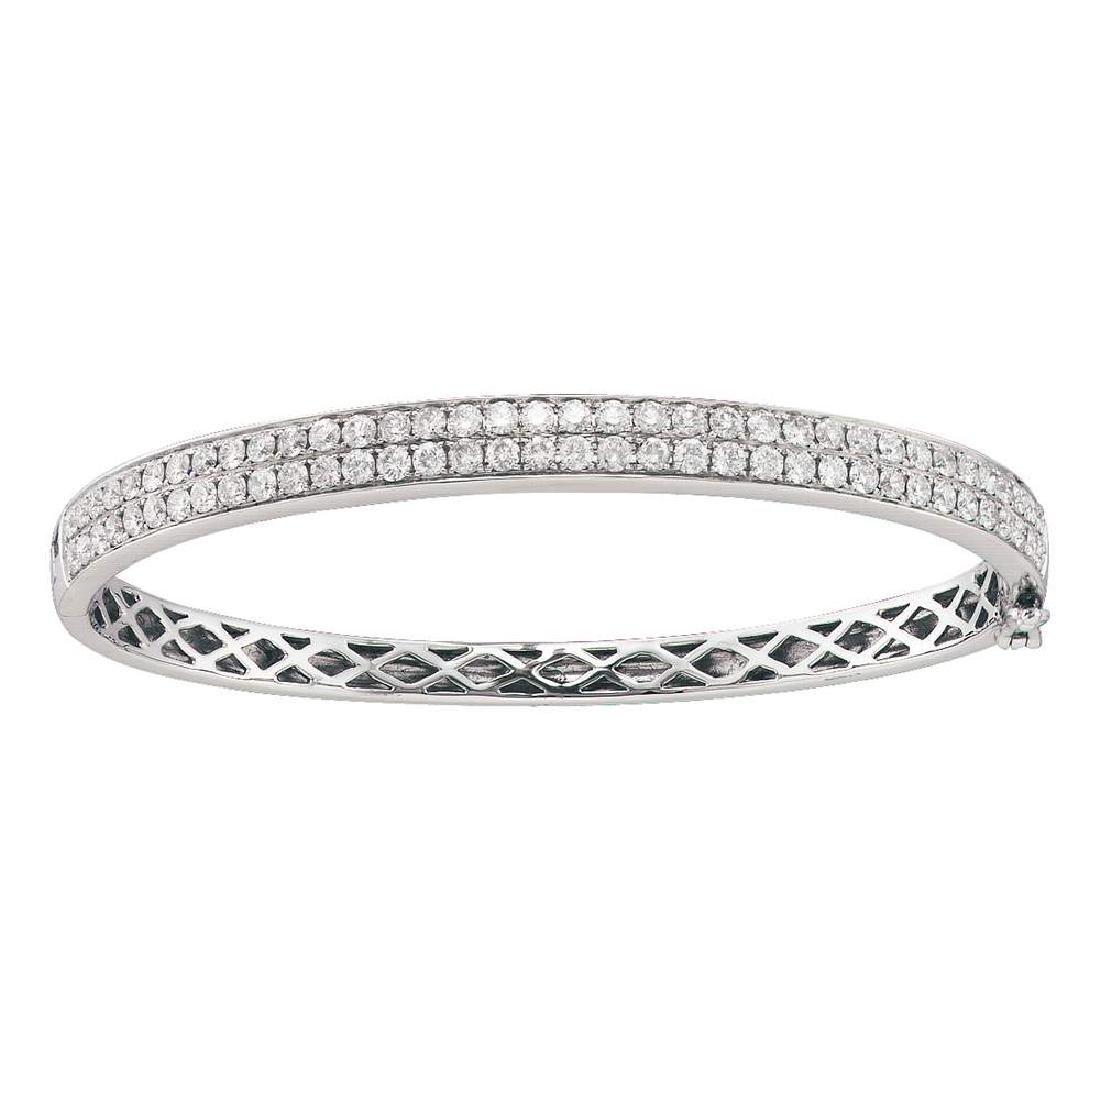 2 CTW Diamond Classic Double Row Bangle Bracelet 14KT